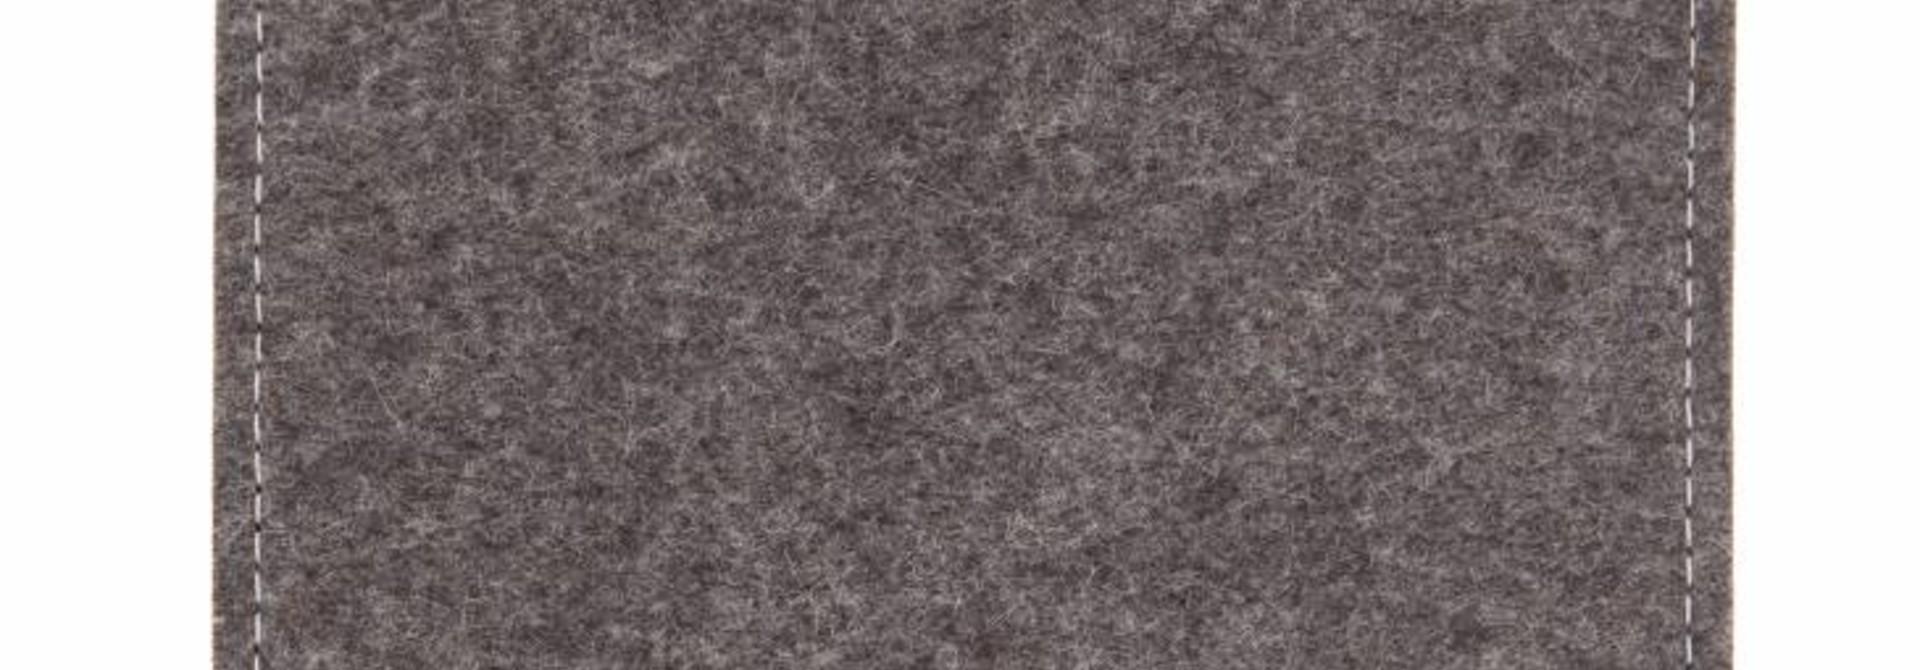 Passport/Elements Sleeve Grey